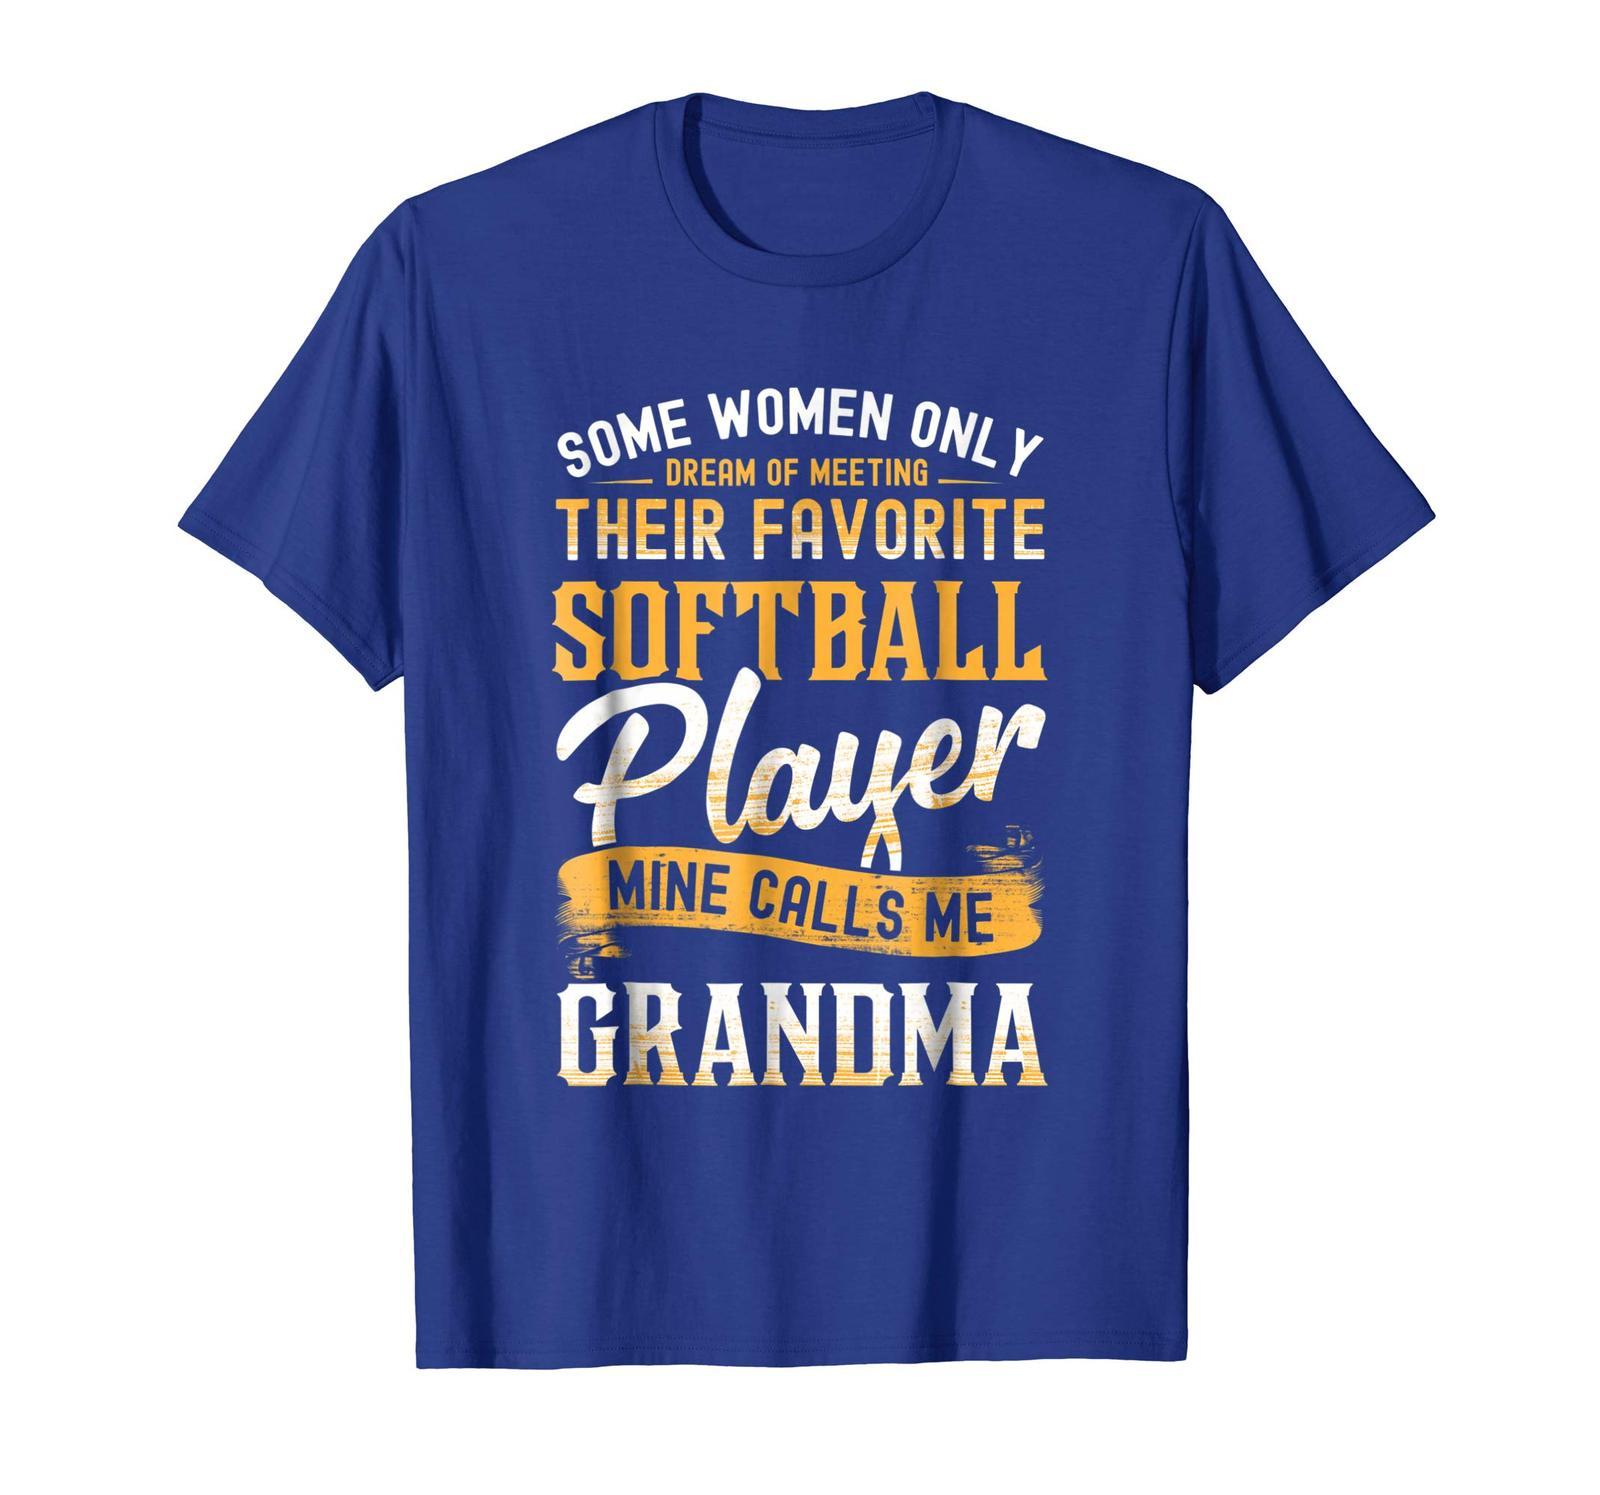 Funny TeeSome Women Dream Softball Player Calls Me Grandma T-Shirt Men